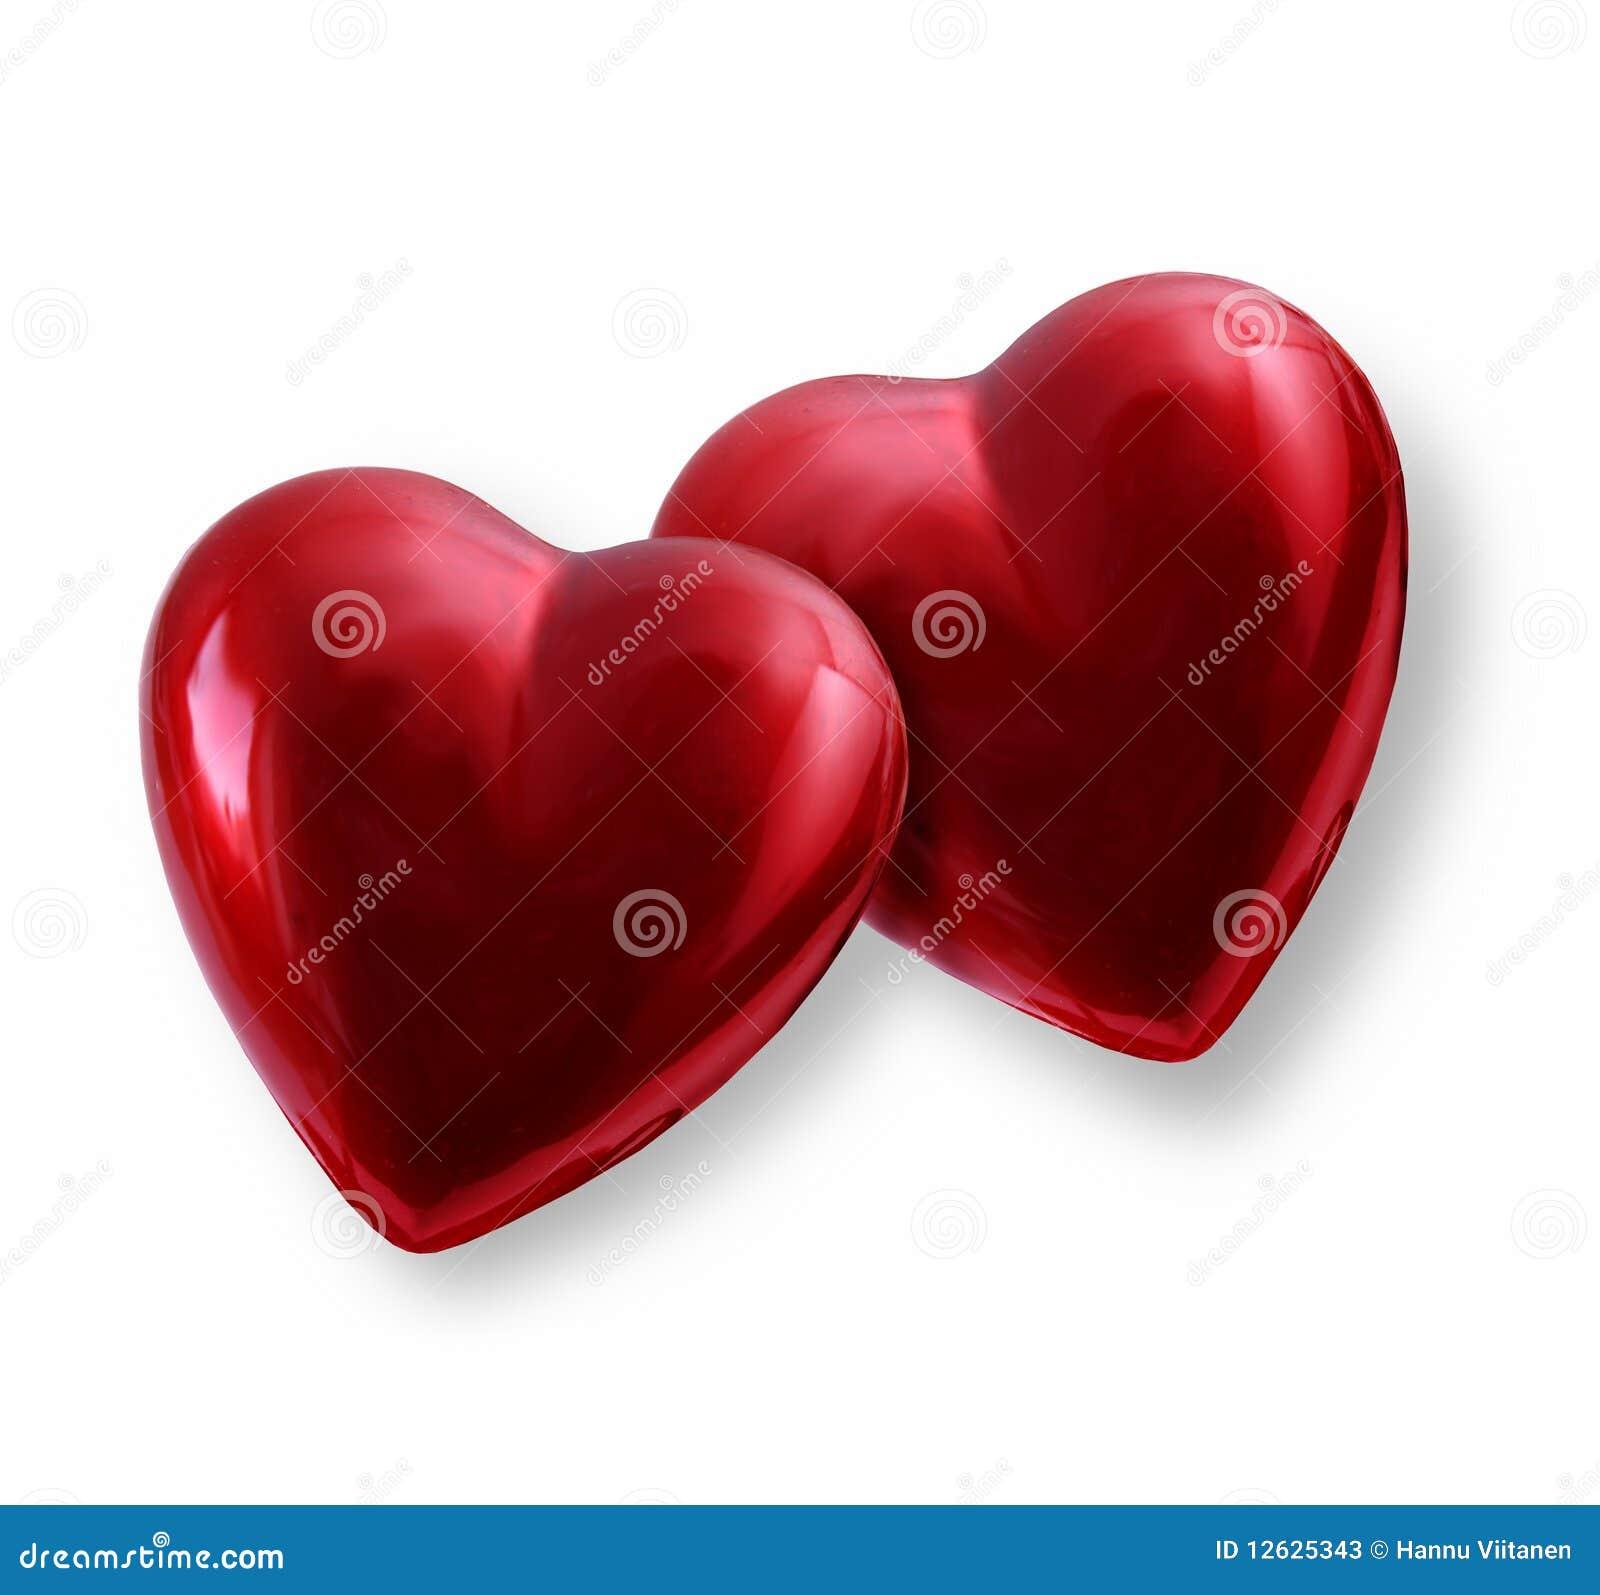 Two Valentine hearts